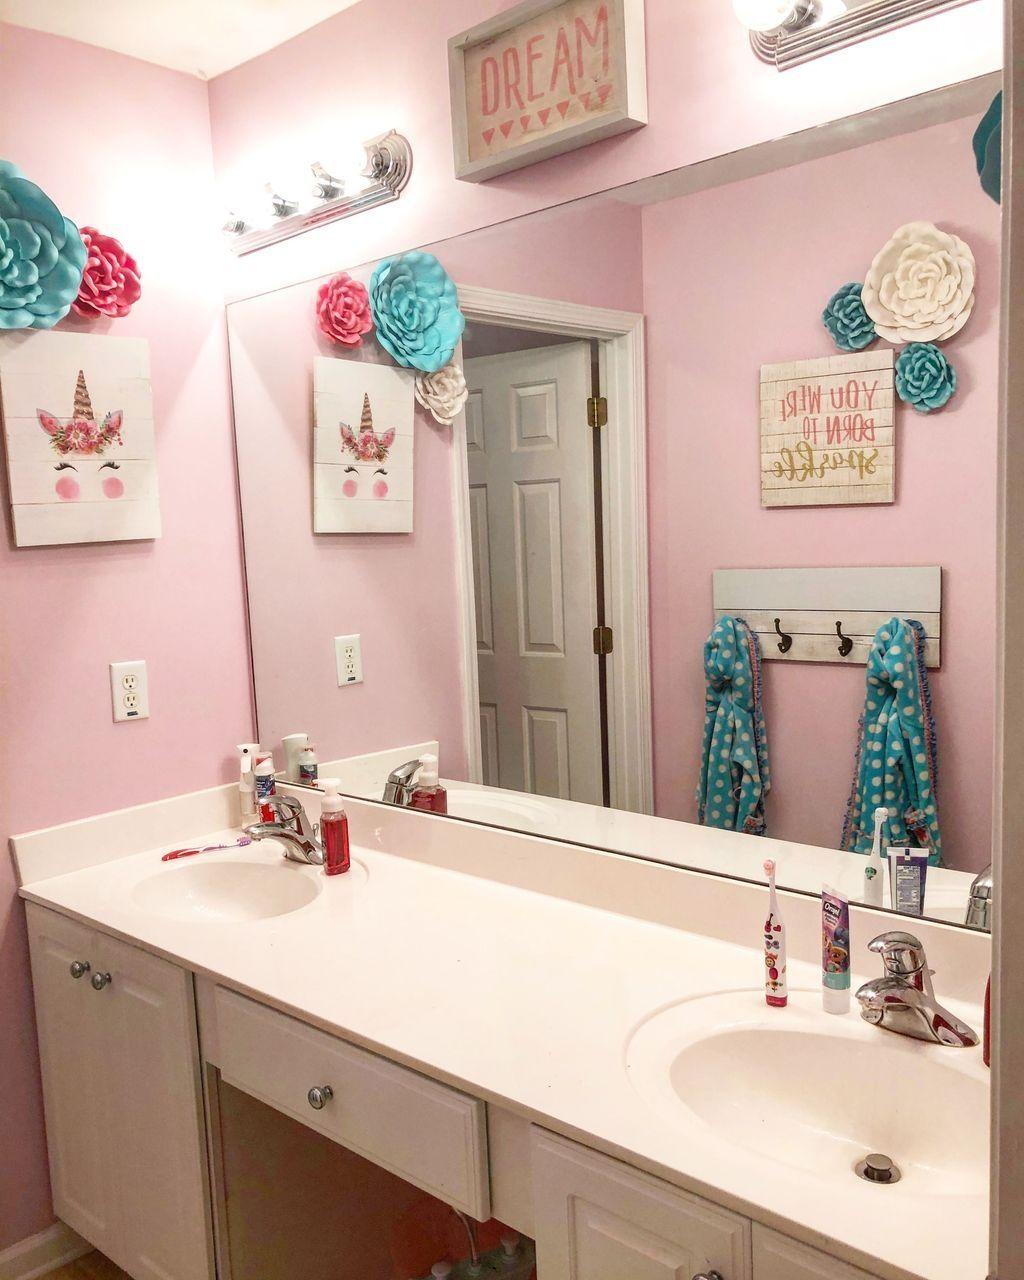 50 Lovely Girls Bathroom Ideas | Girl bathroom decor, Girl ...